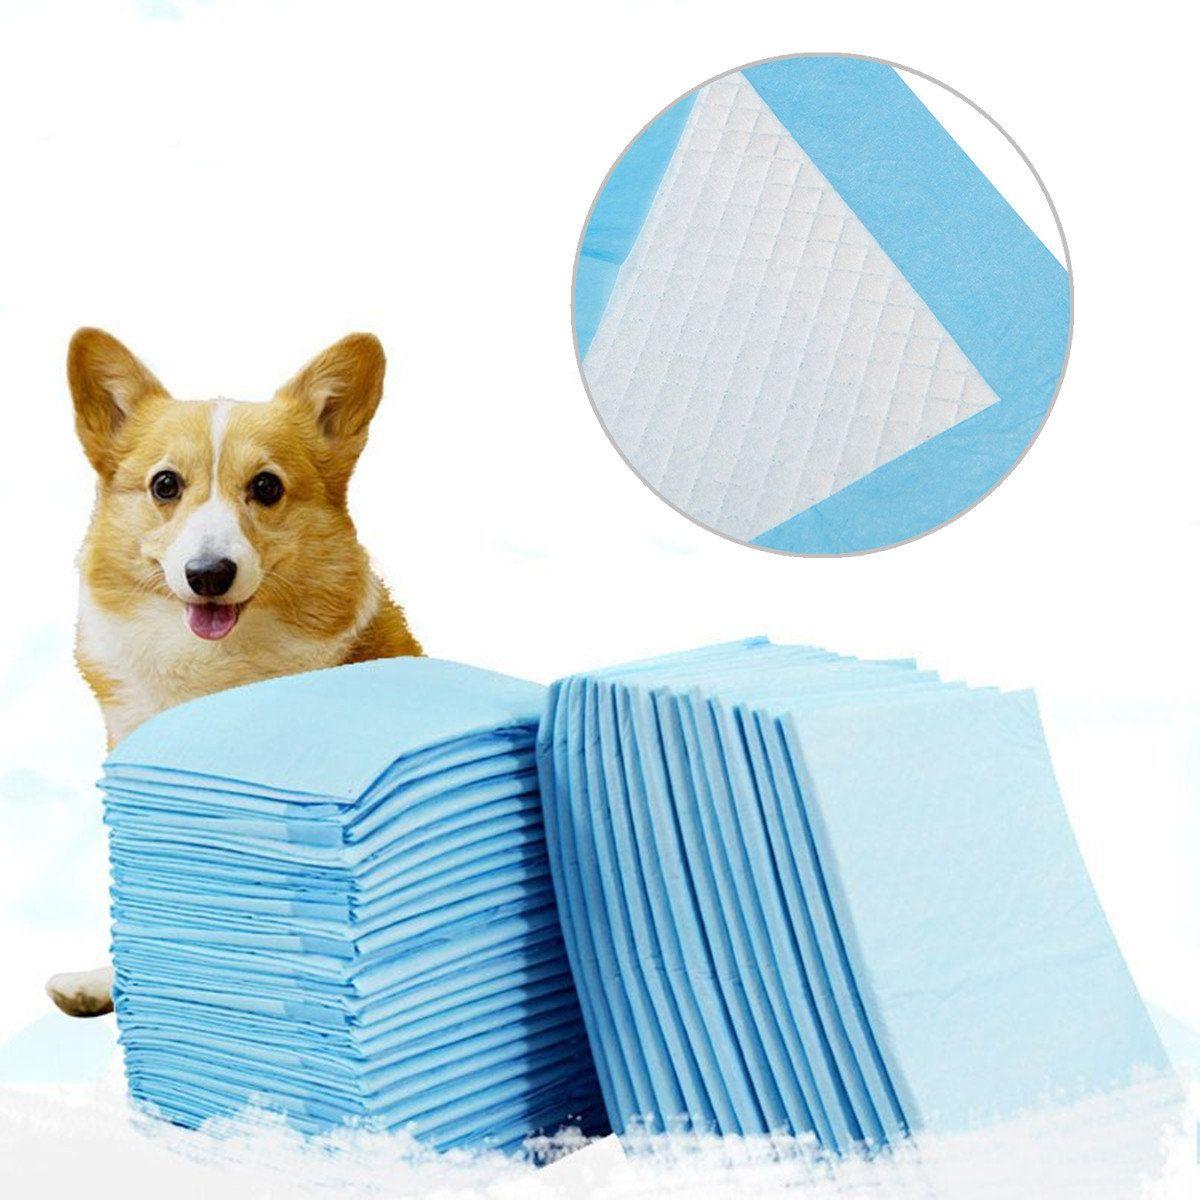 Pet Indoor Training Dog Puppy Pads Super Absorbent Cat